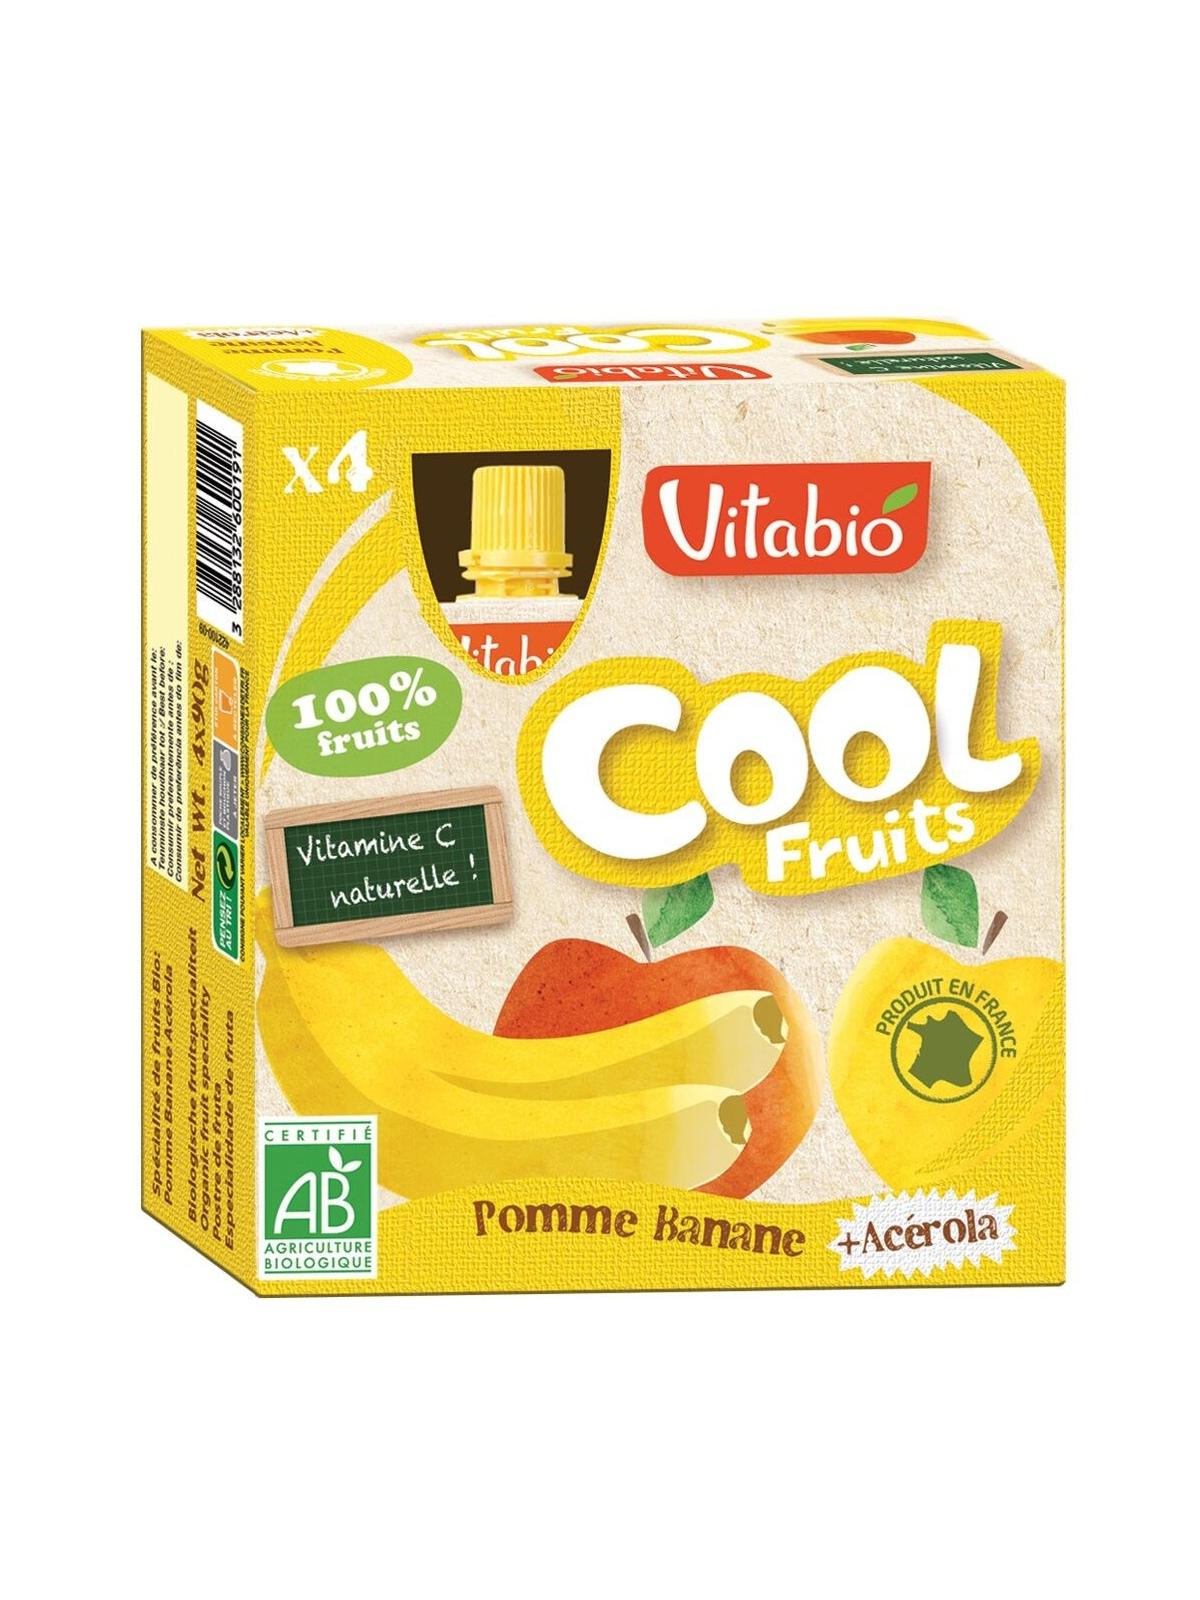 Vitabio Cool Fruits Manzana-Platano